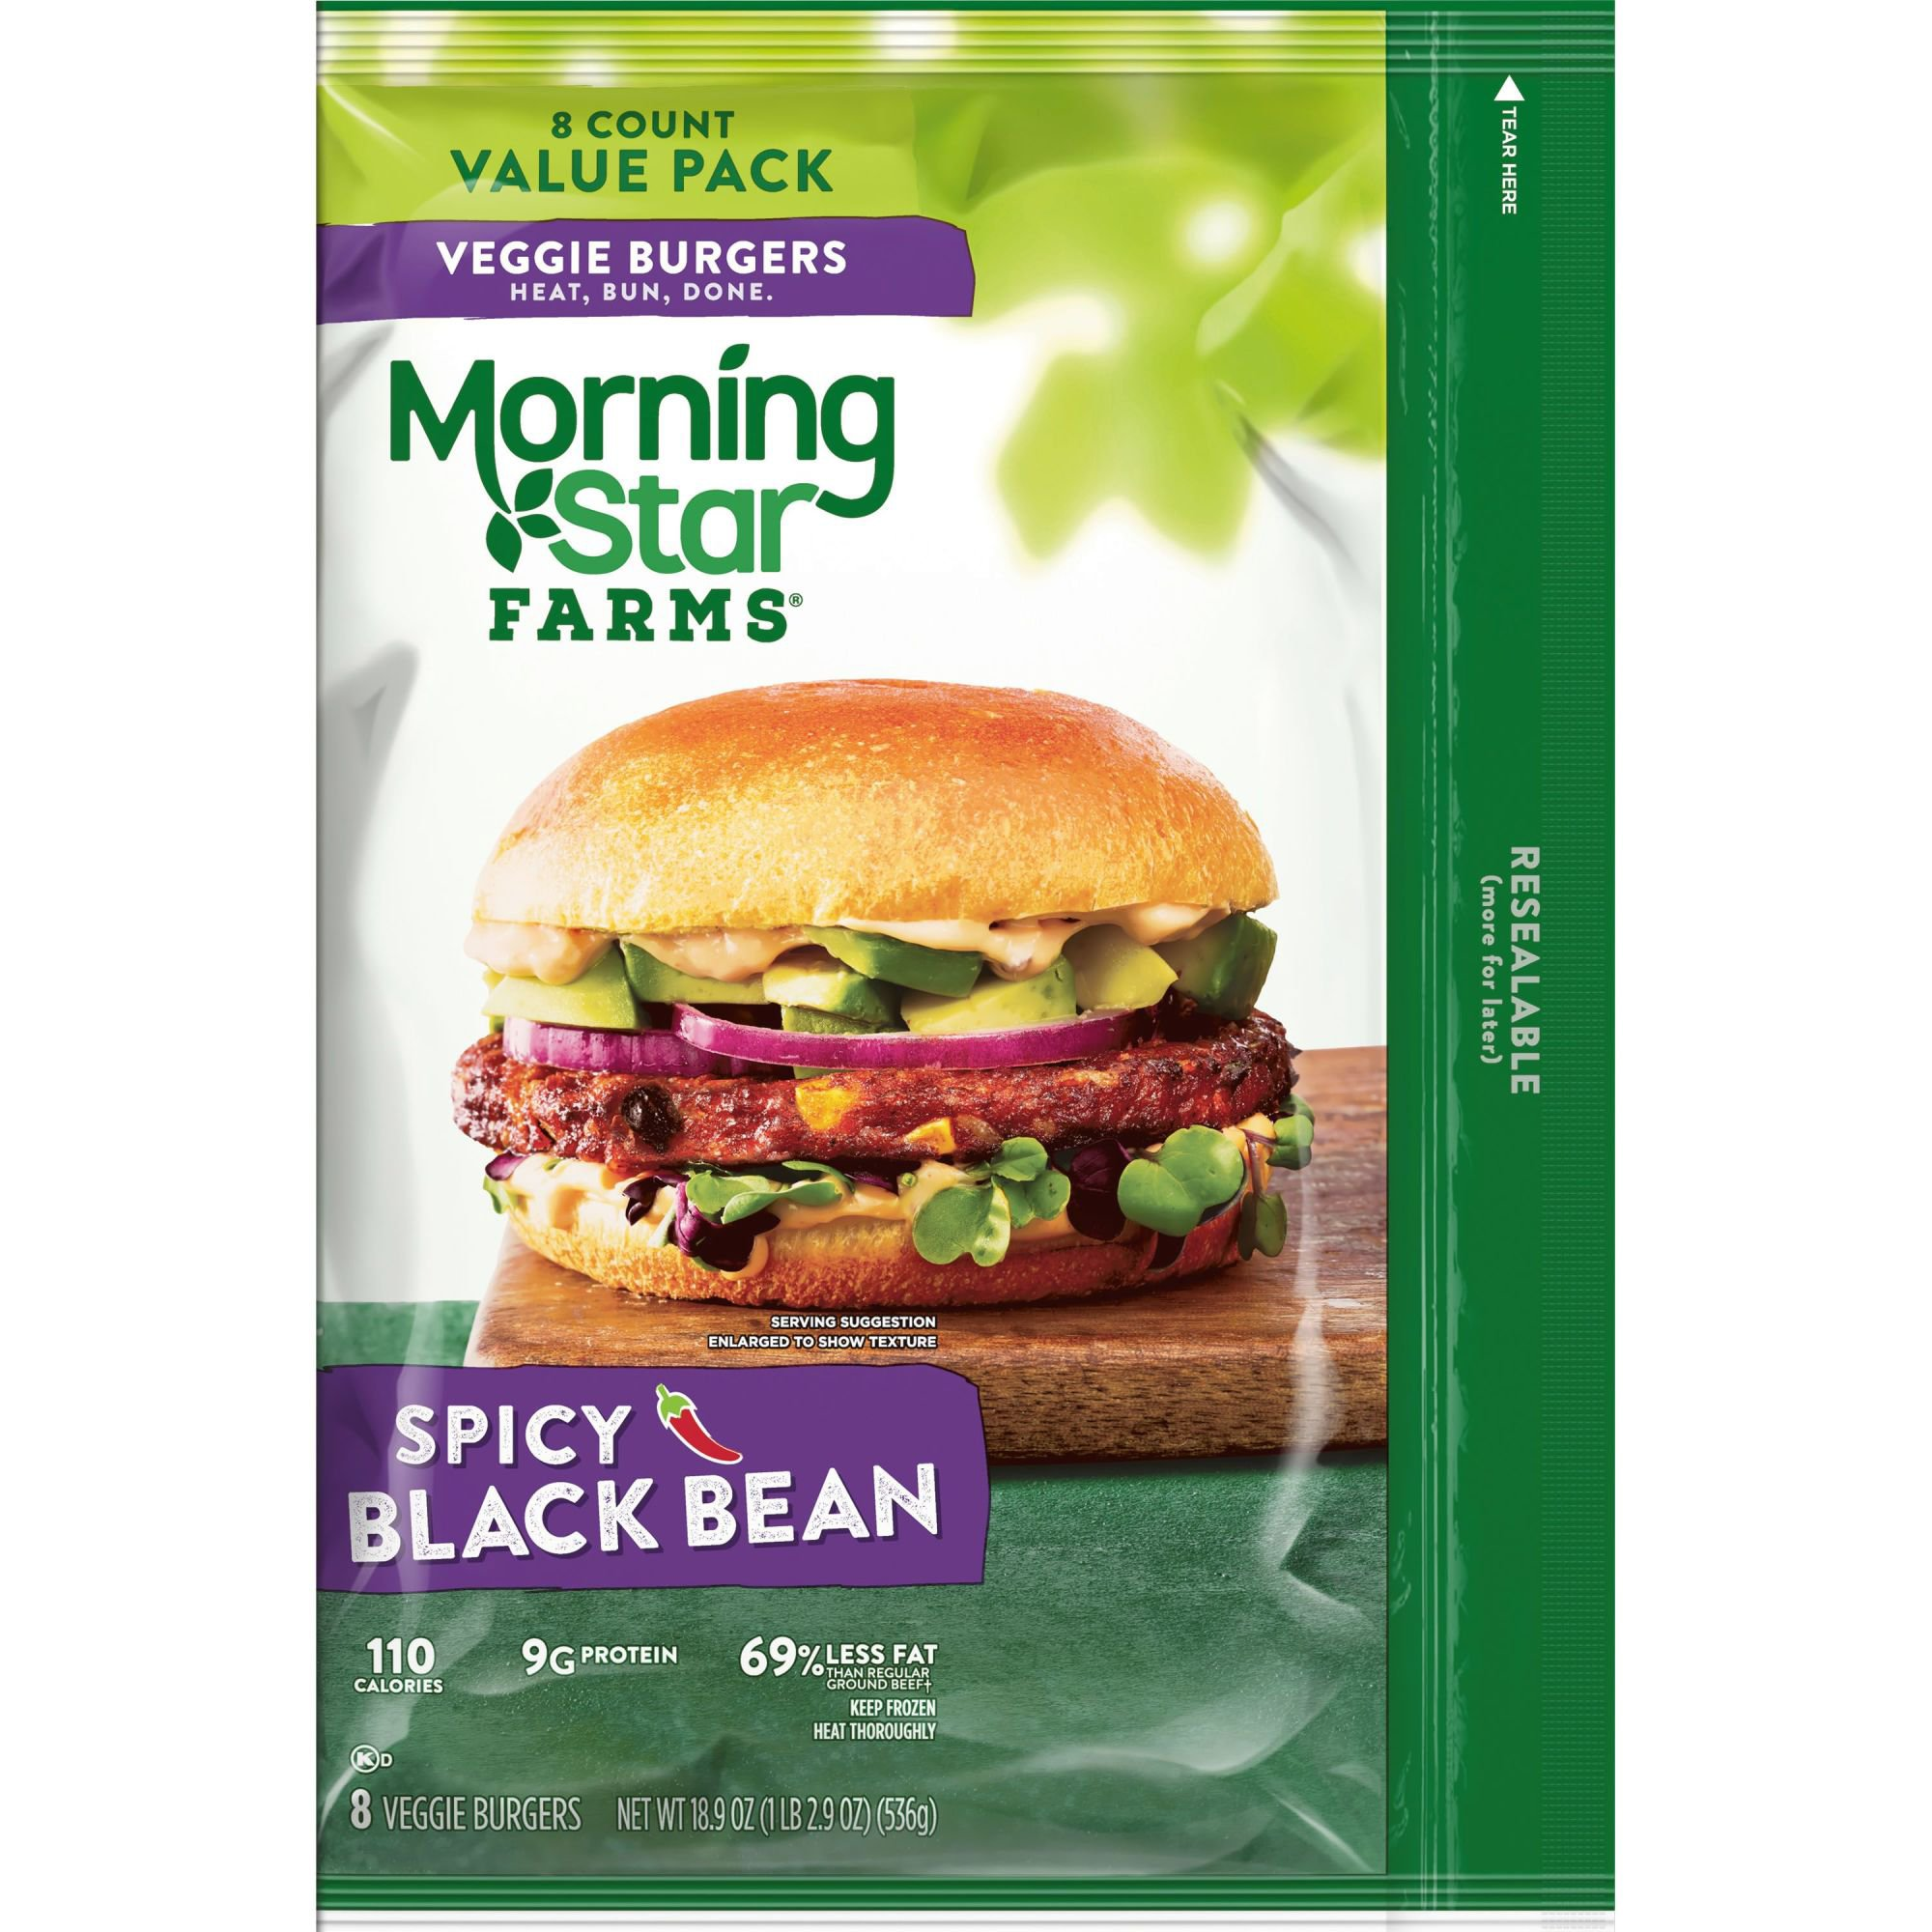 Morningstar Farms Spicy Black Bean Veggie Patties Value Pack Shop